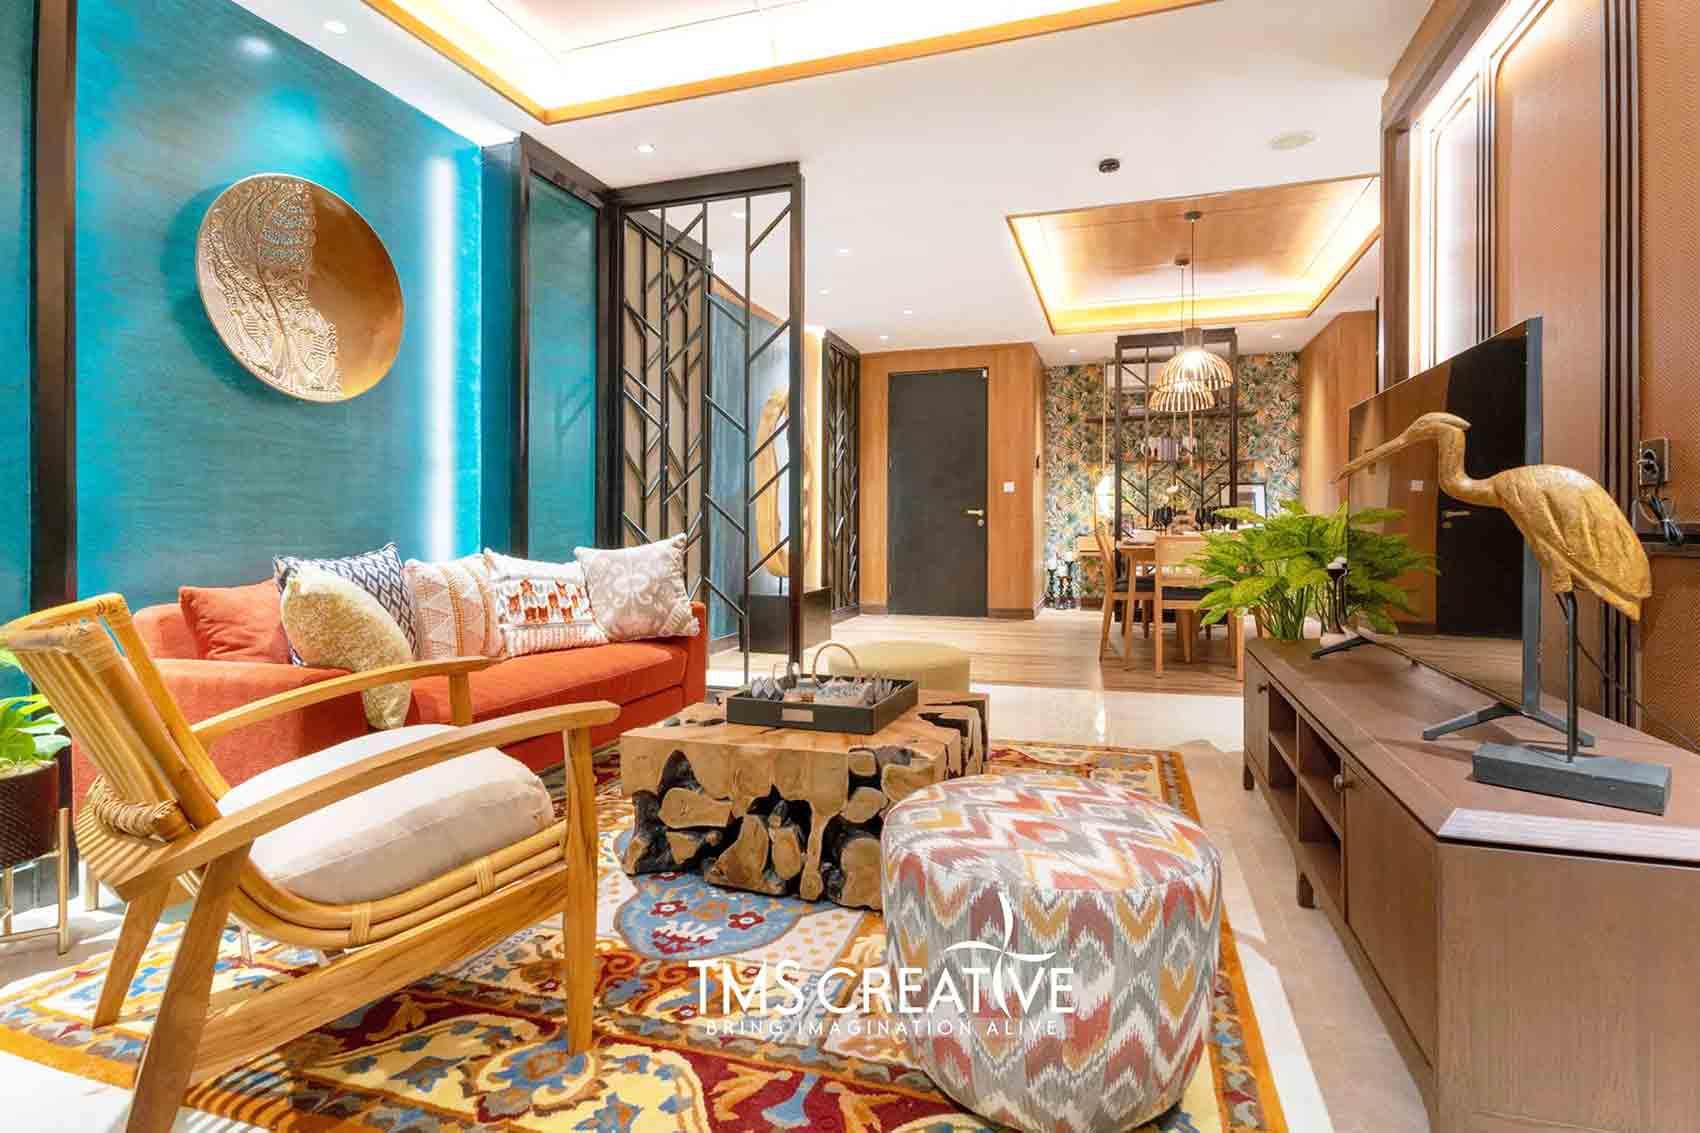 Desain Interior Apartemen Eklektik Kontemporer yang Glamor dan Elegan | Foto artikel Arsitag